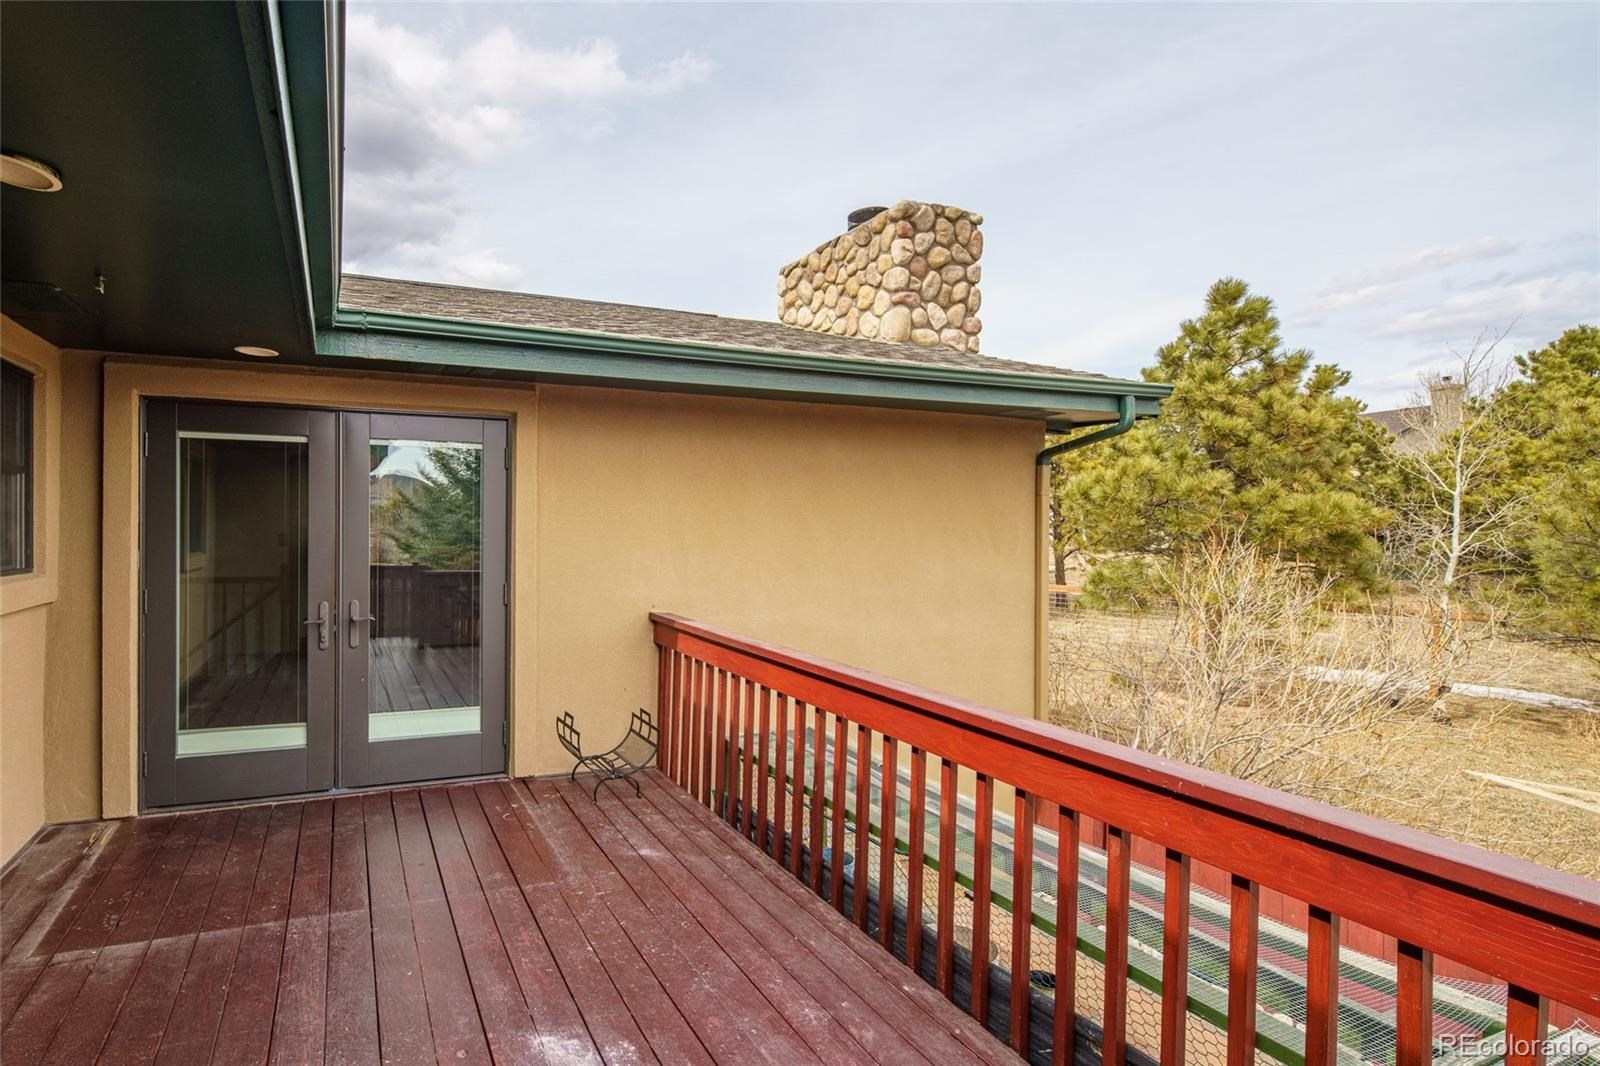 MLS# 9205685 - 16 - 17720 Pioneer Crossing, Colorado Springs, CO 80908